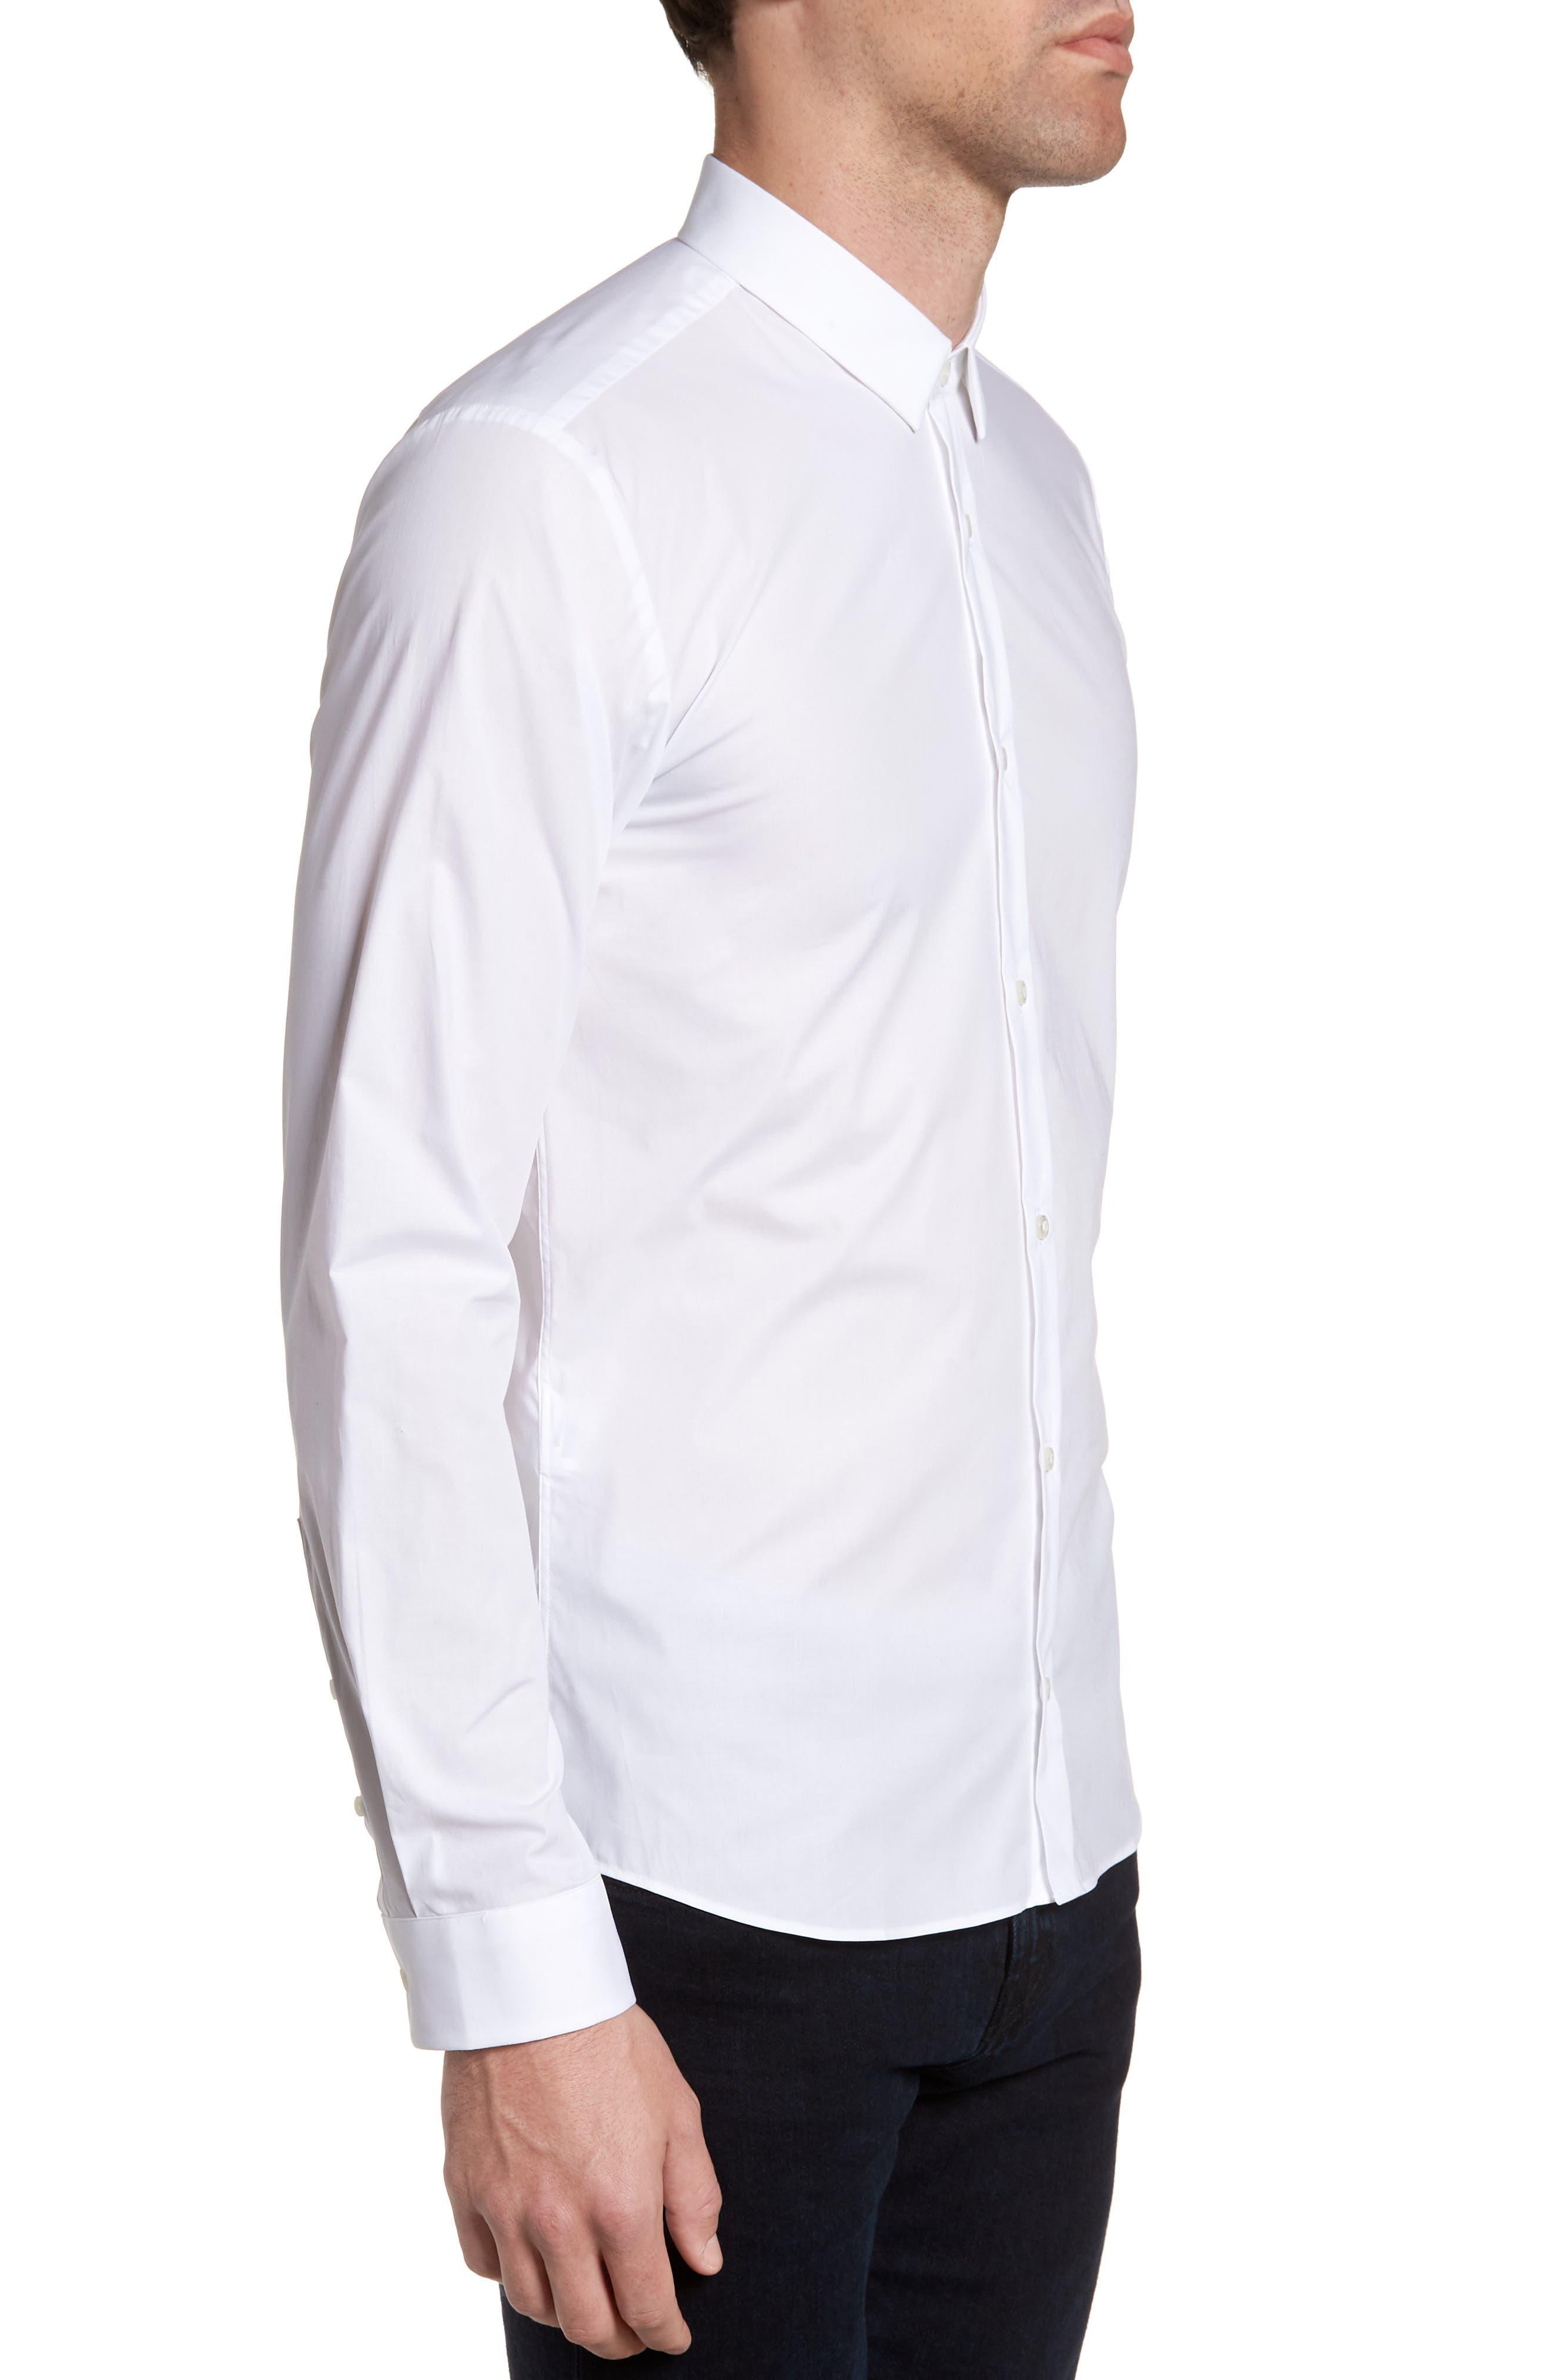 Ero3 Trim Fit Sport Shirt,                             Alternate thumbnail 3, color,                             White